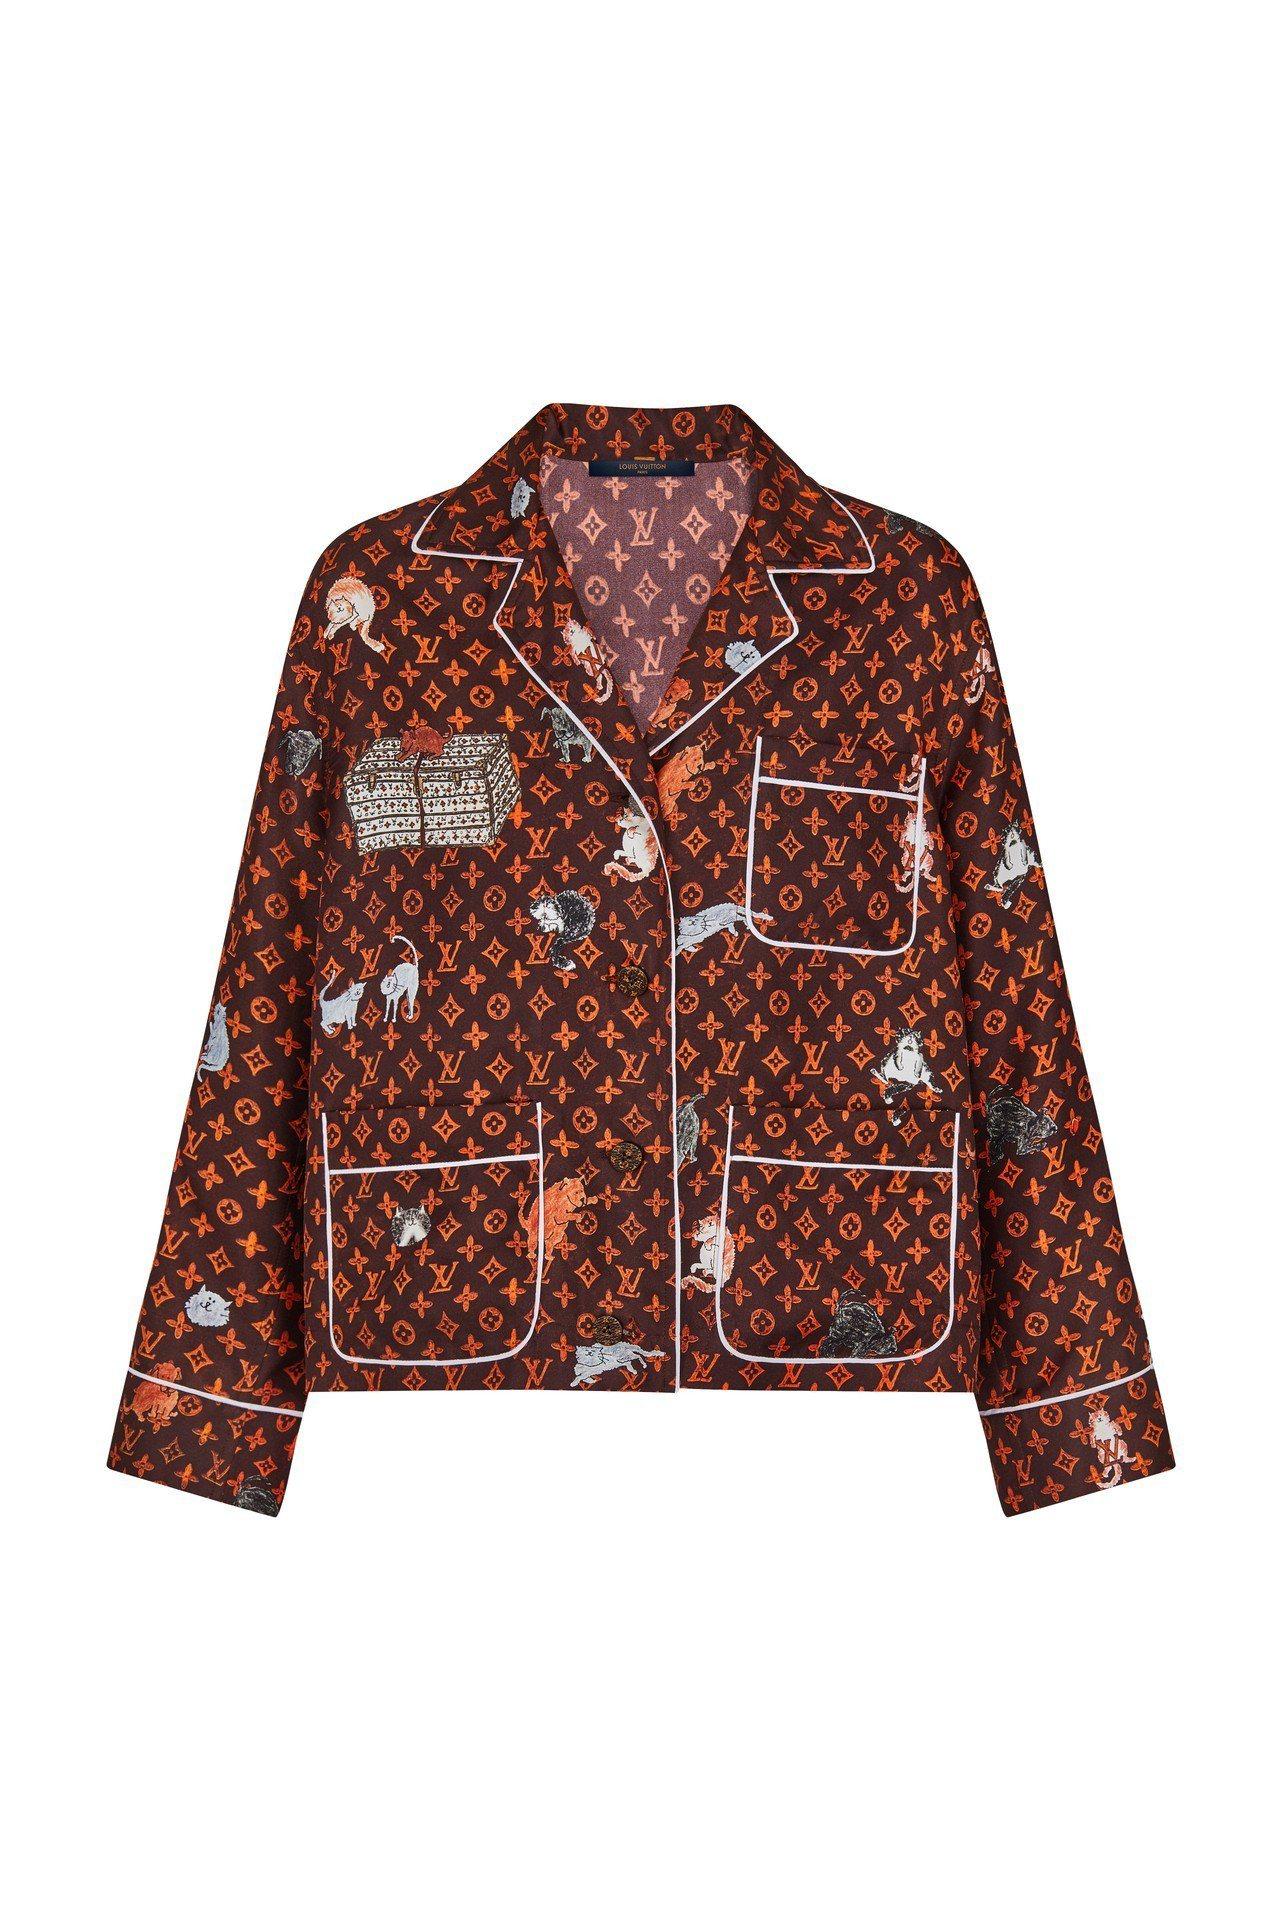 LV X Grace Coddington襯衫,售價65,500元。圖/LV提供